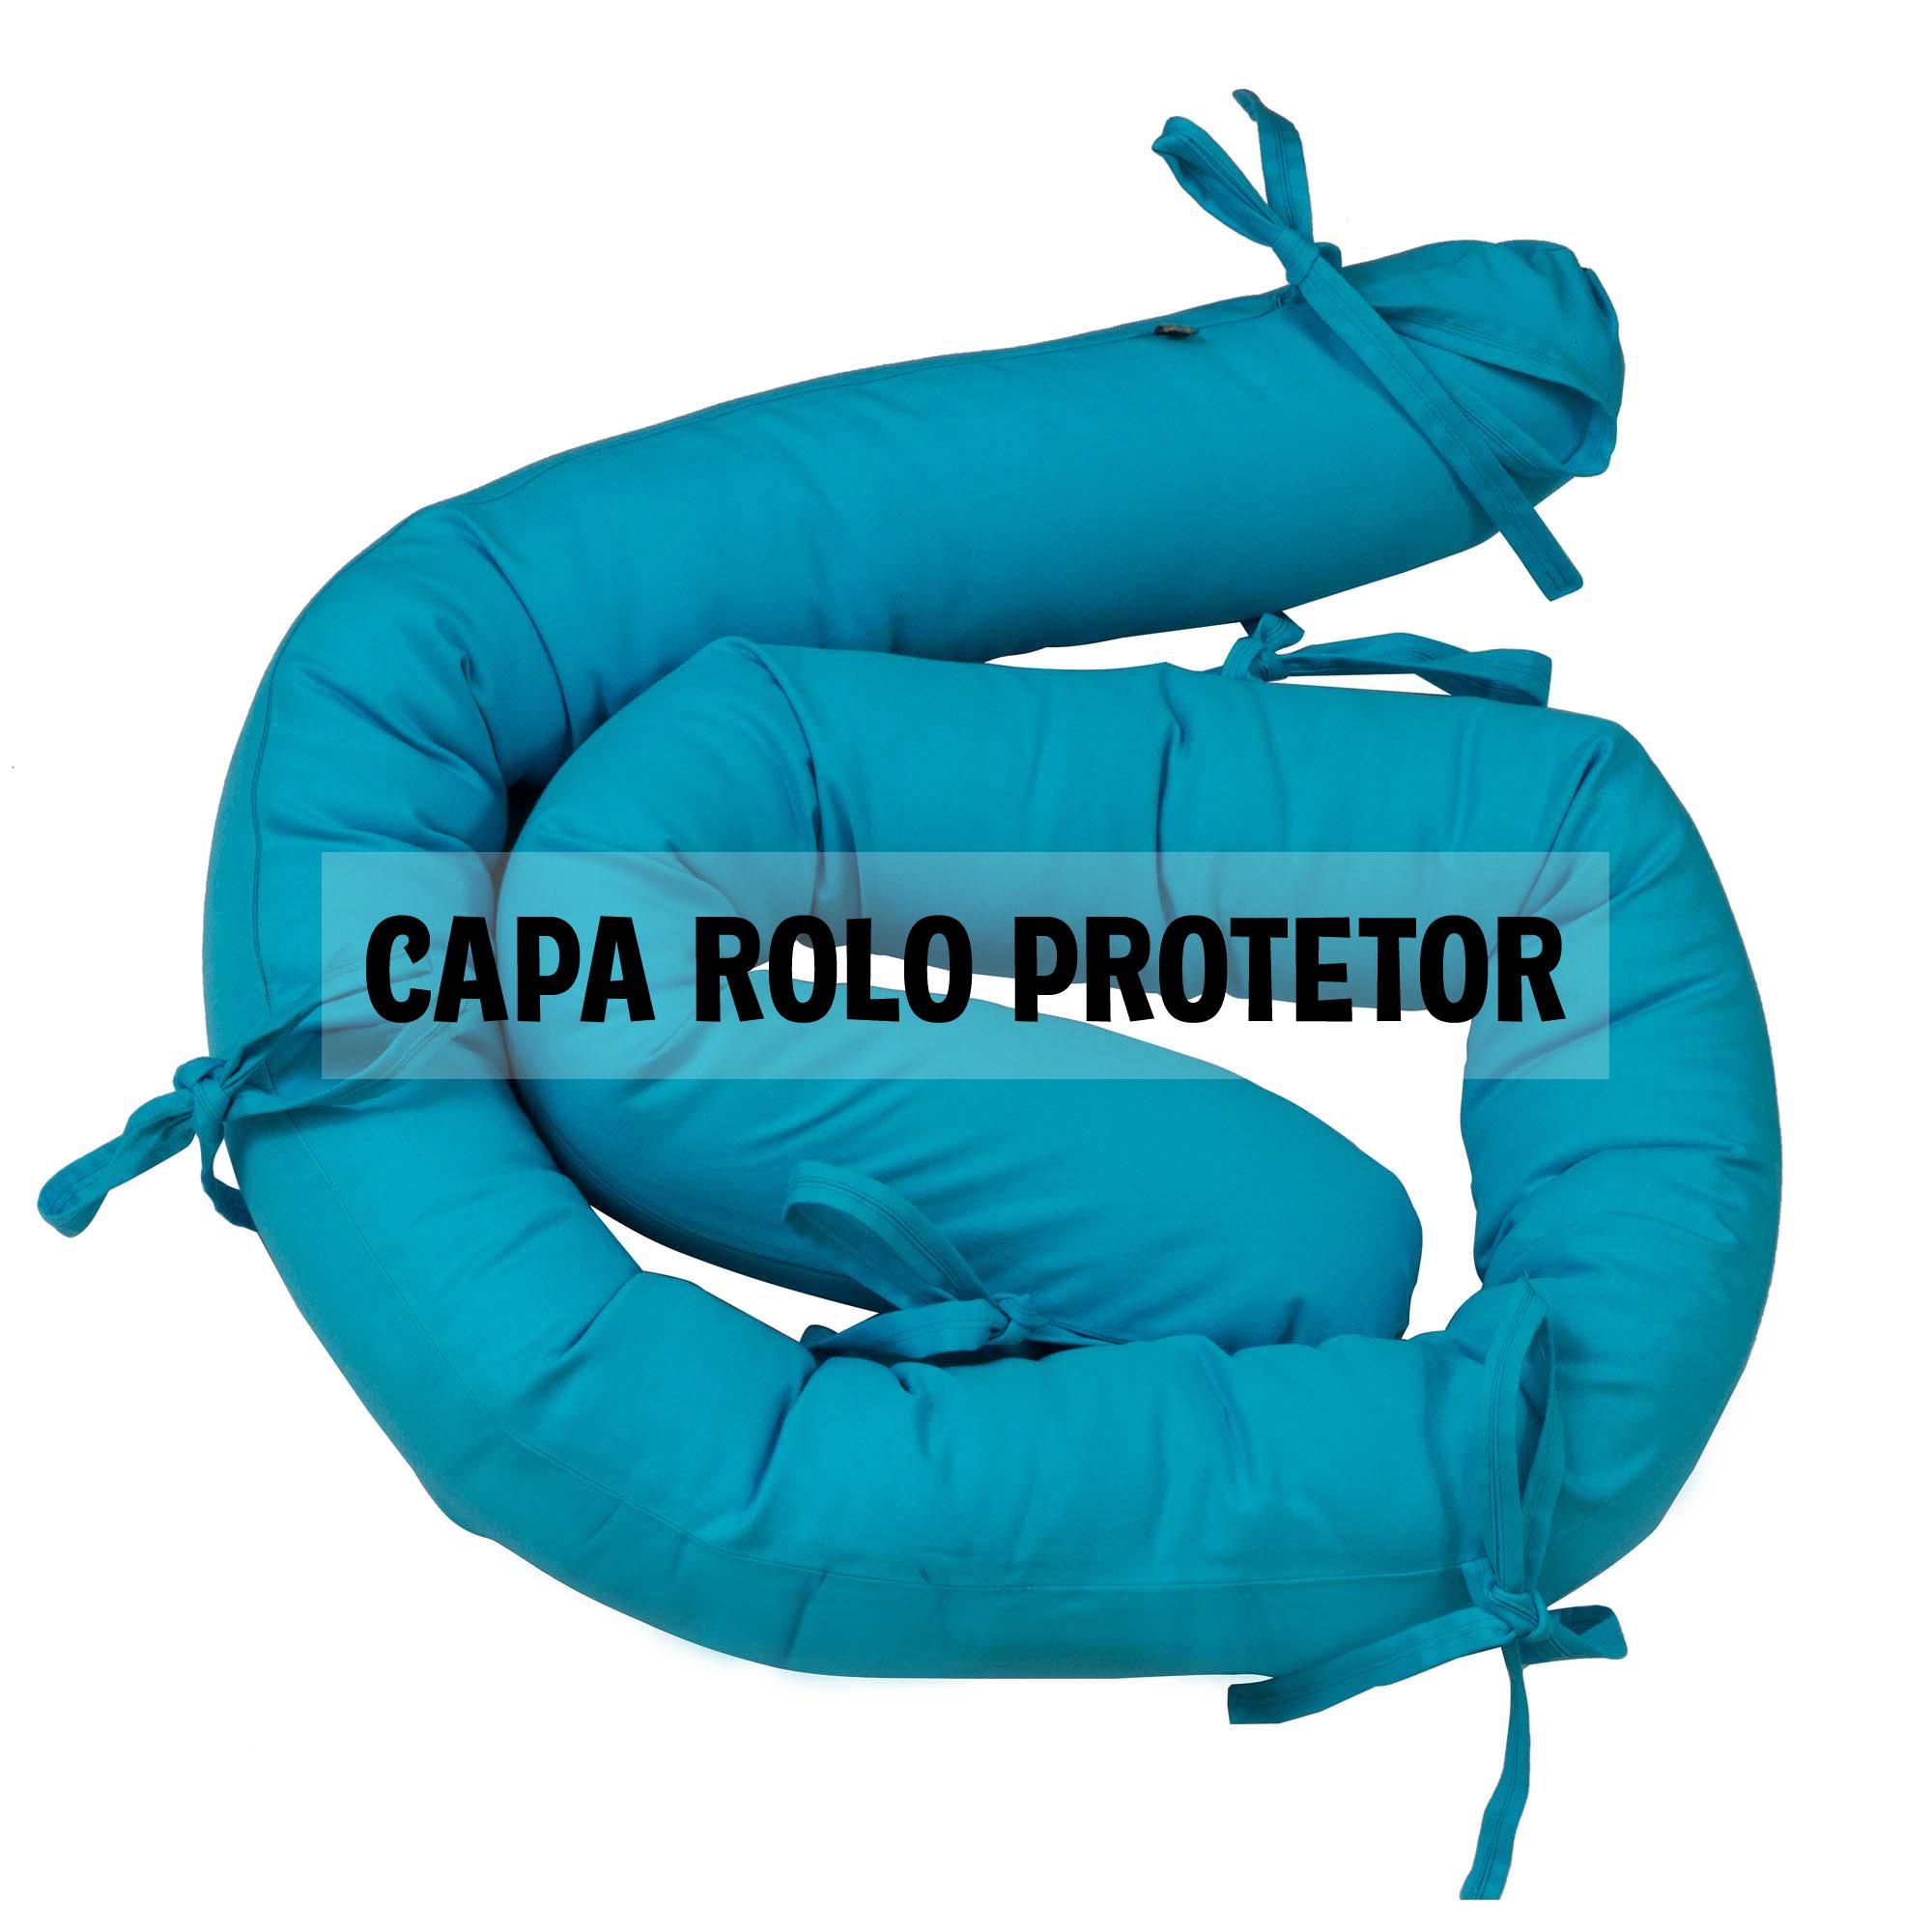 Capa de rolo protetor espaguete azul turquesa